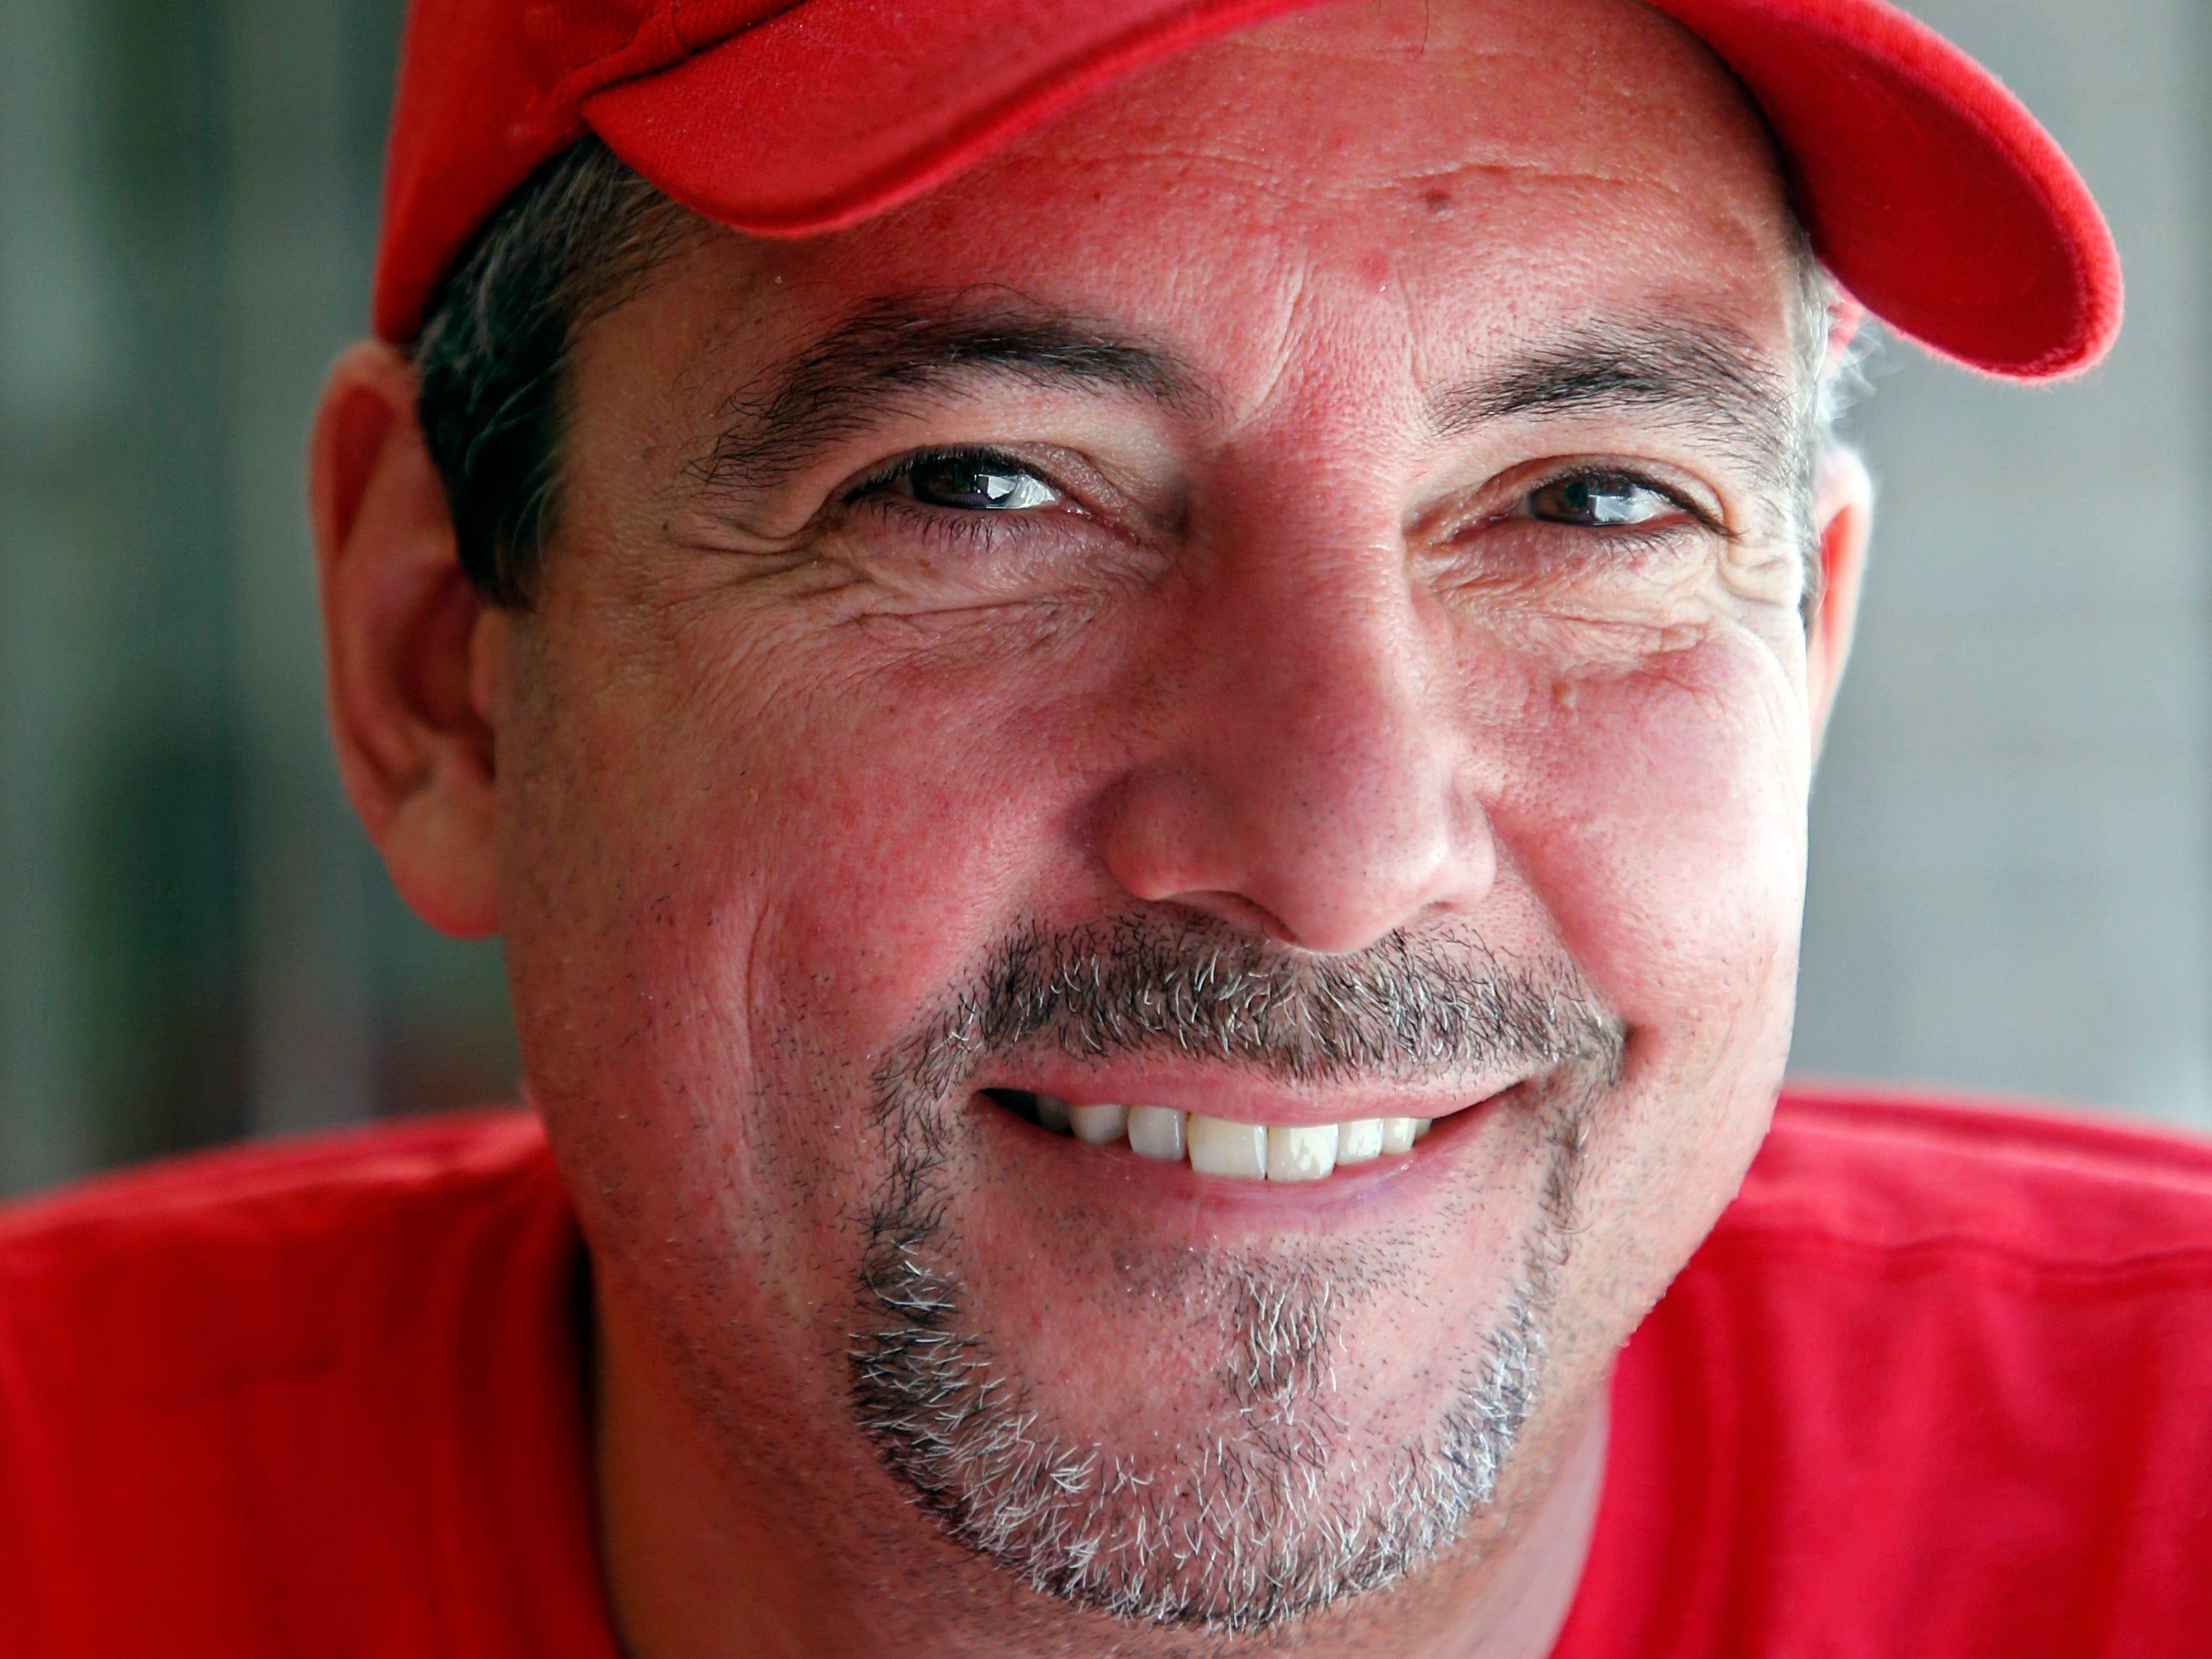 Owner Todd Varallo is seen at Varallo's Chile Parlor & Restaurant Monday, Oct. 29, 2018, in Nashville, Tenn.